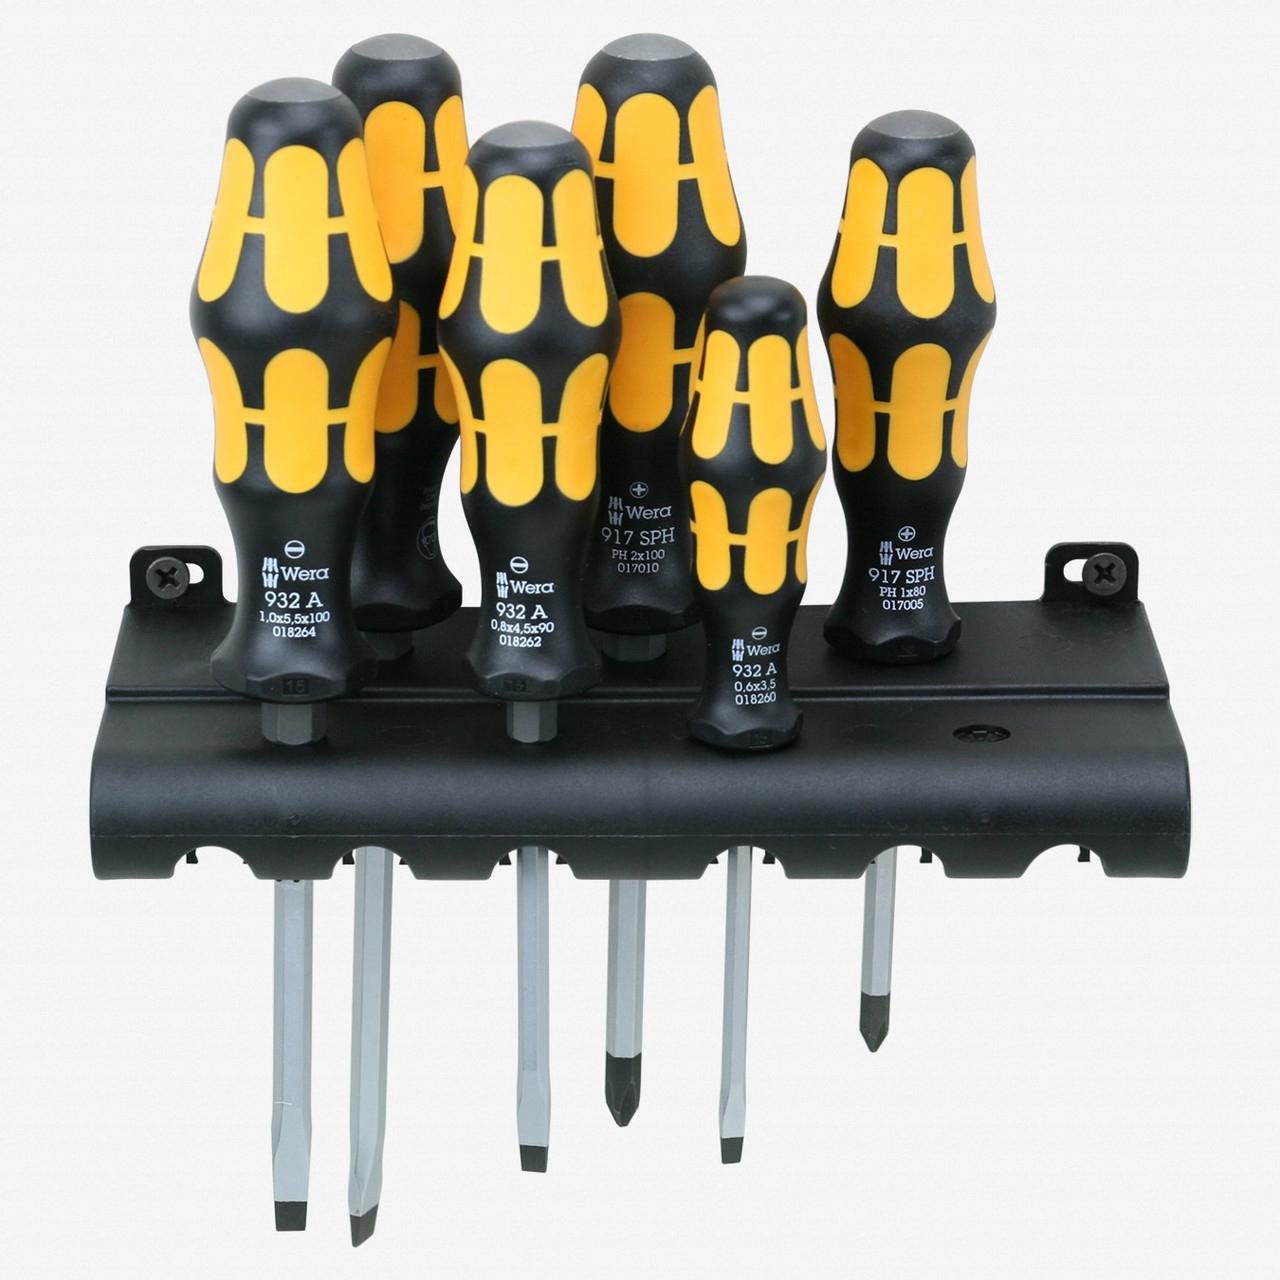 Wera 018282 Kraftform Plus Slotted/Phillips Screwdriver Set + Rack - KC Tool